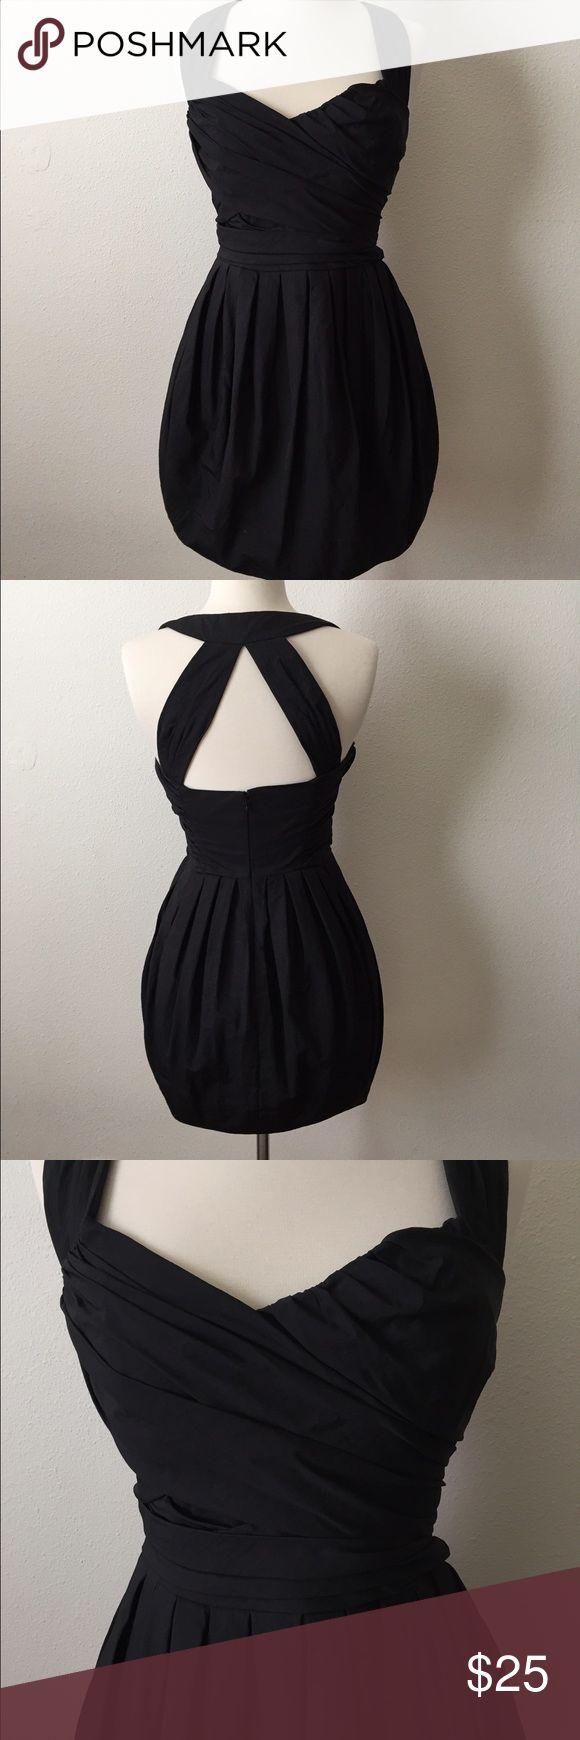 Allsaints spitalfields black dress sz. 4 Black mini halter dress sz. 4. Structured fabric. Fuller skirt. Allsaints Dresses Mini